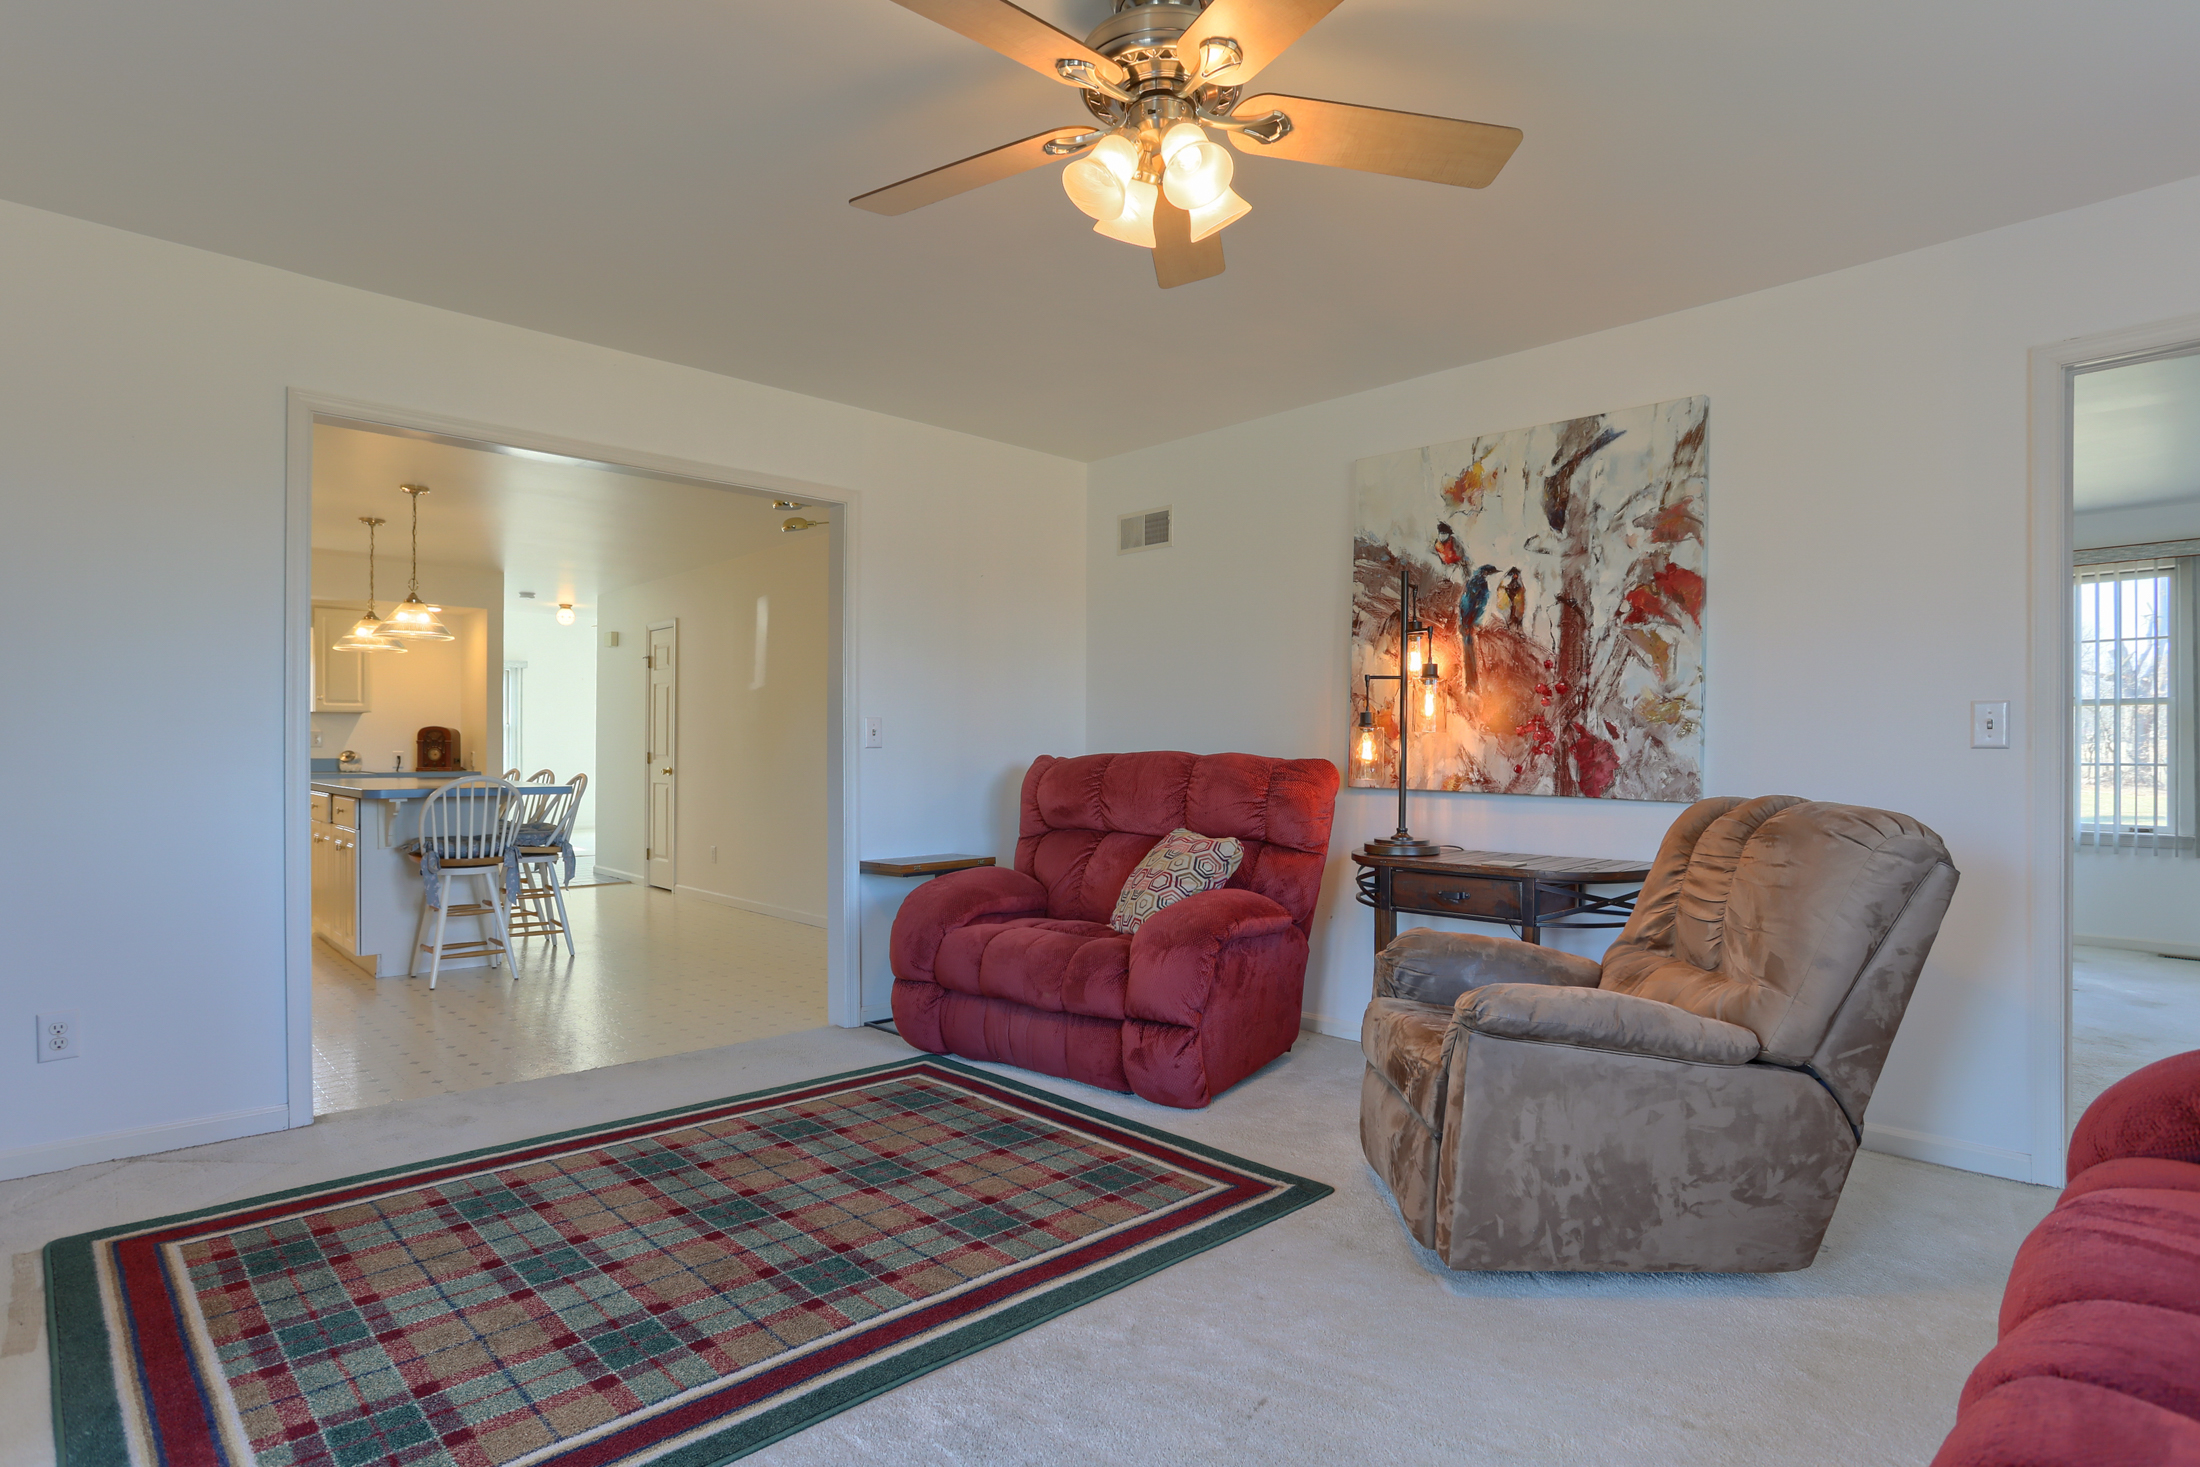 26 W. Strack Drive - Living Room